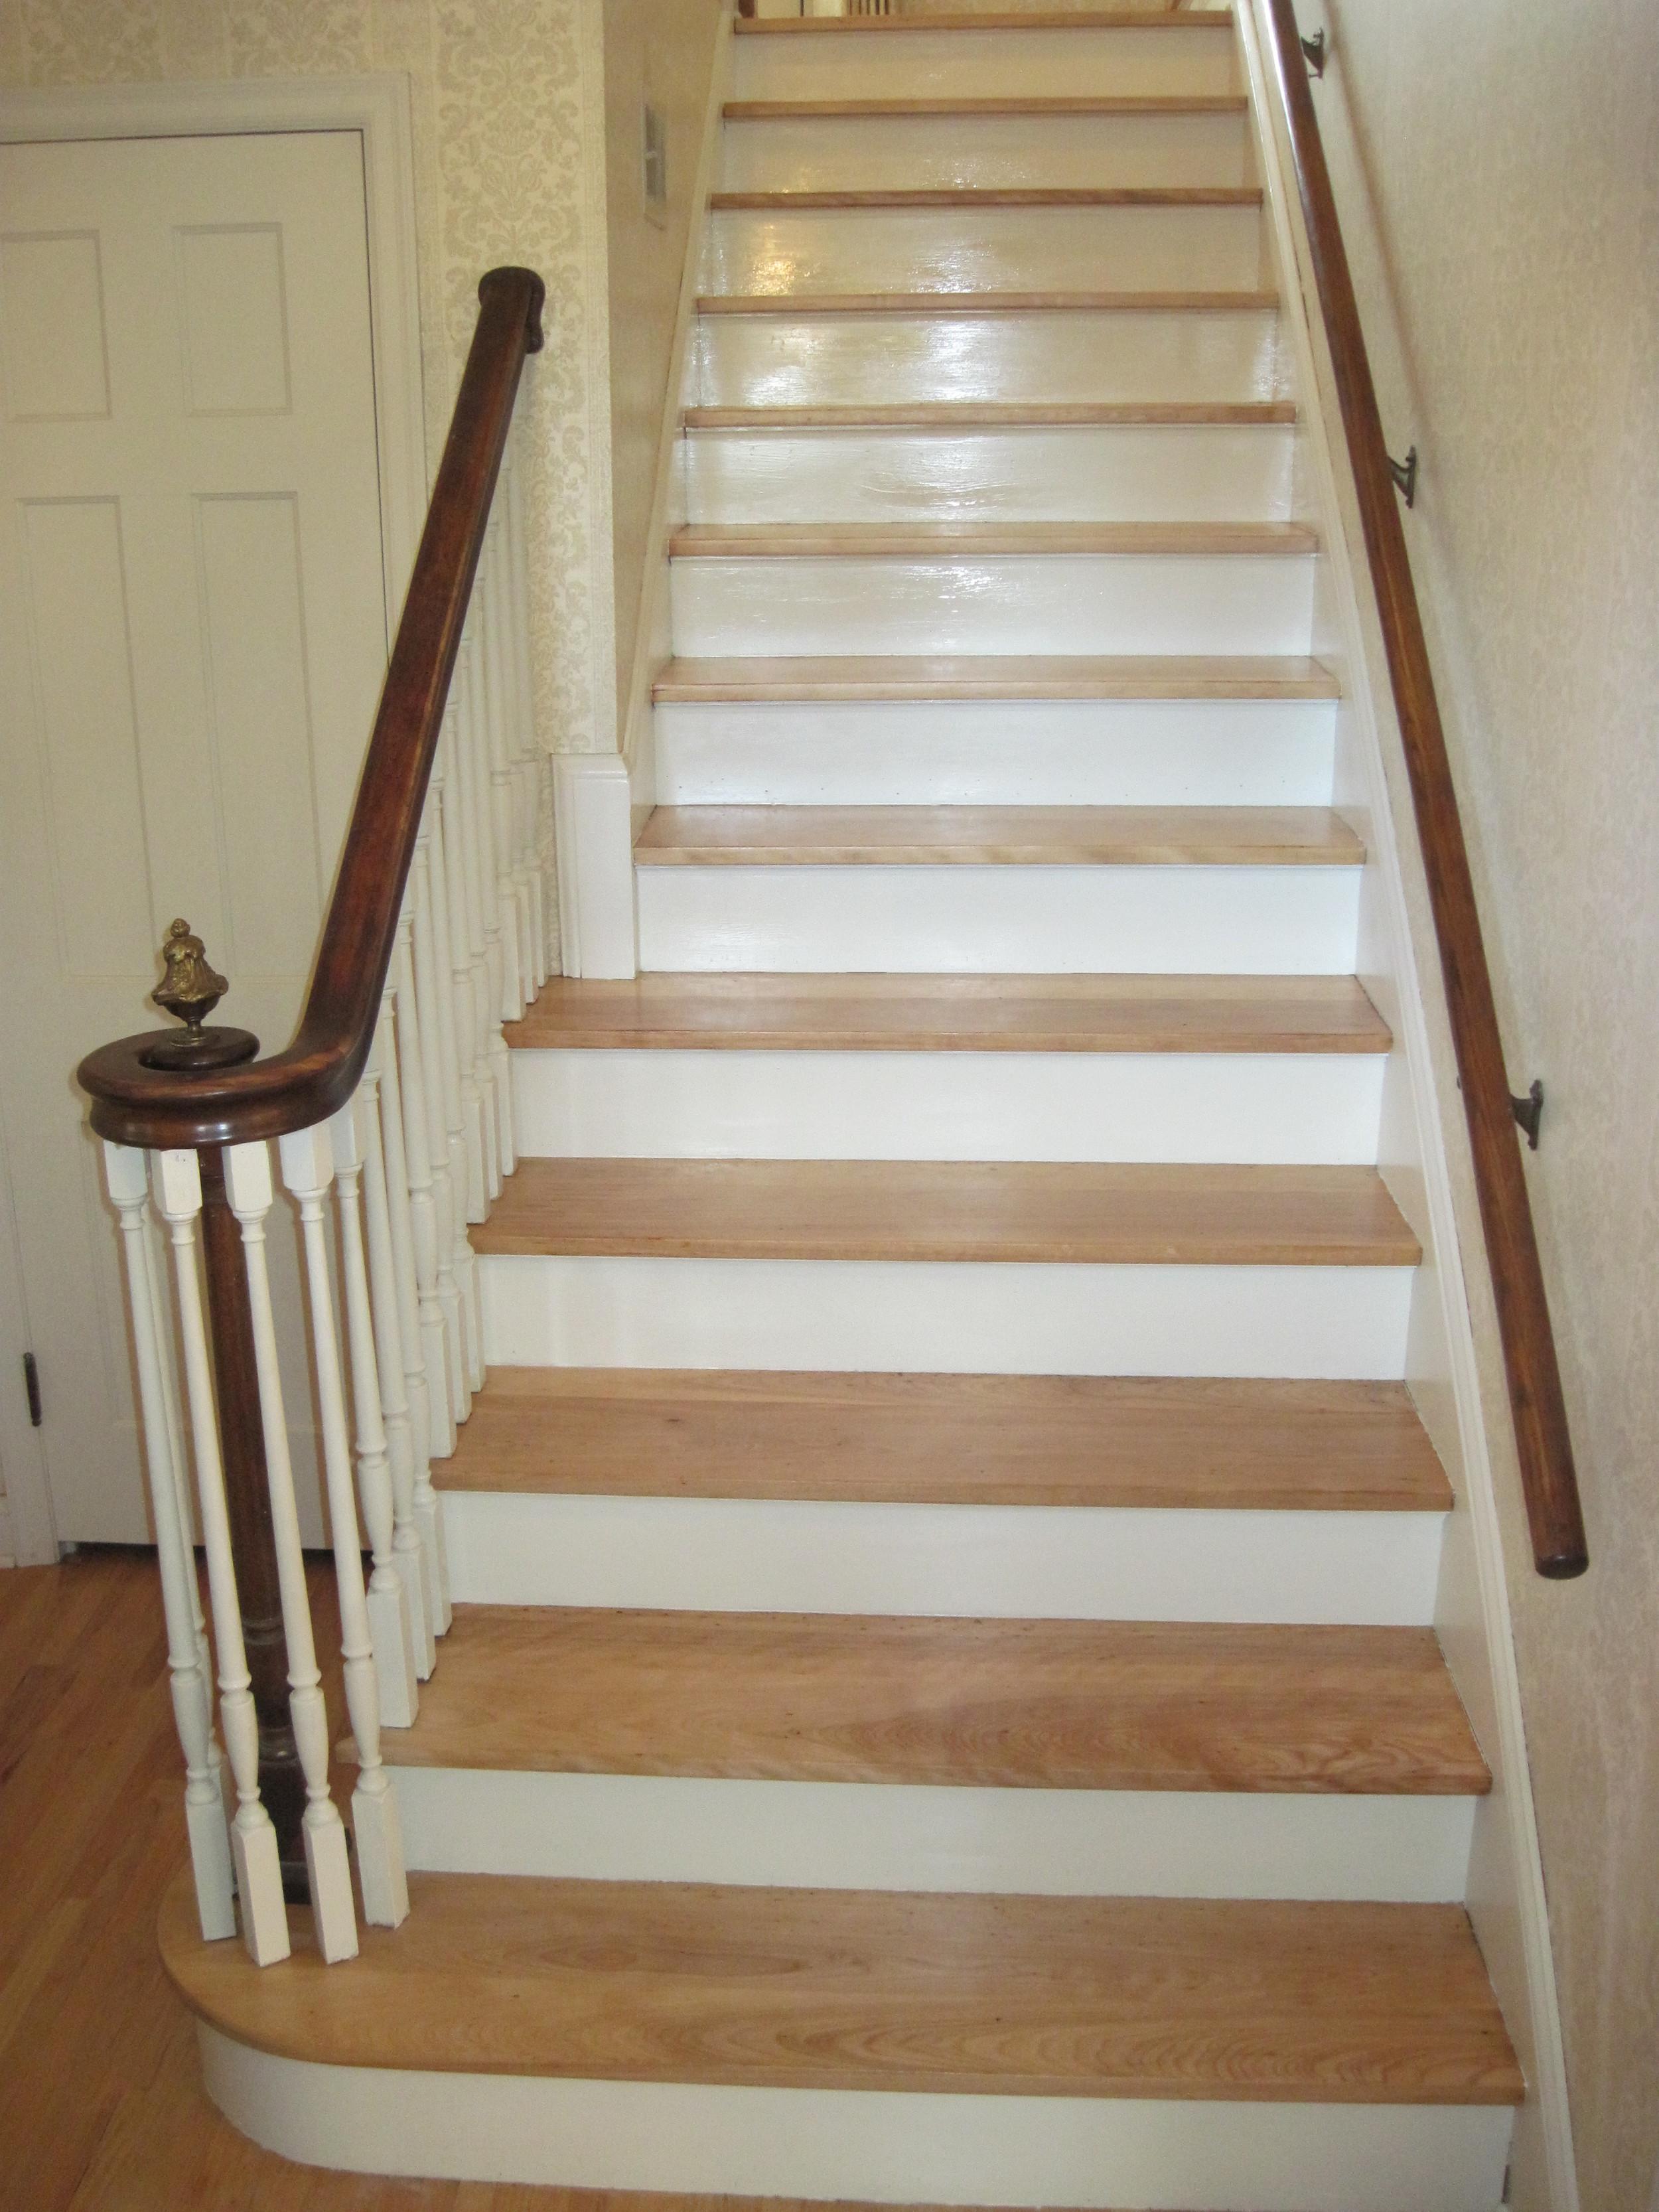 Butternut staircase